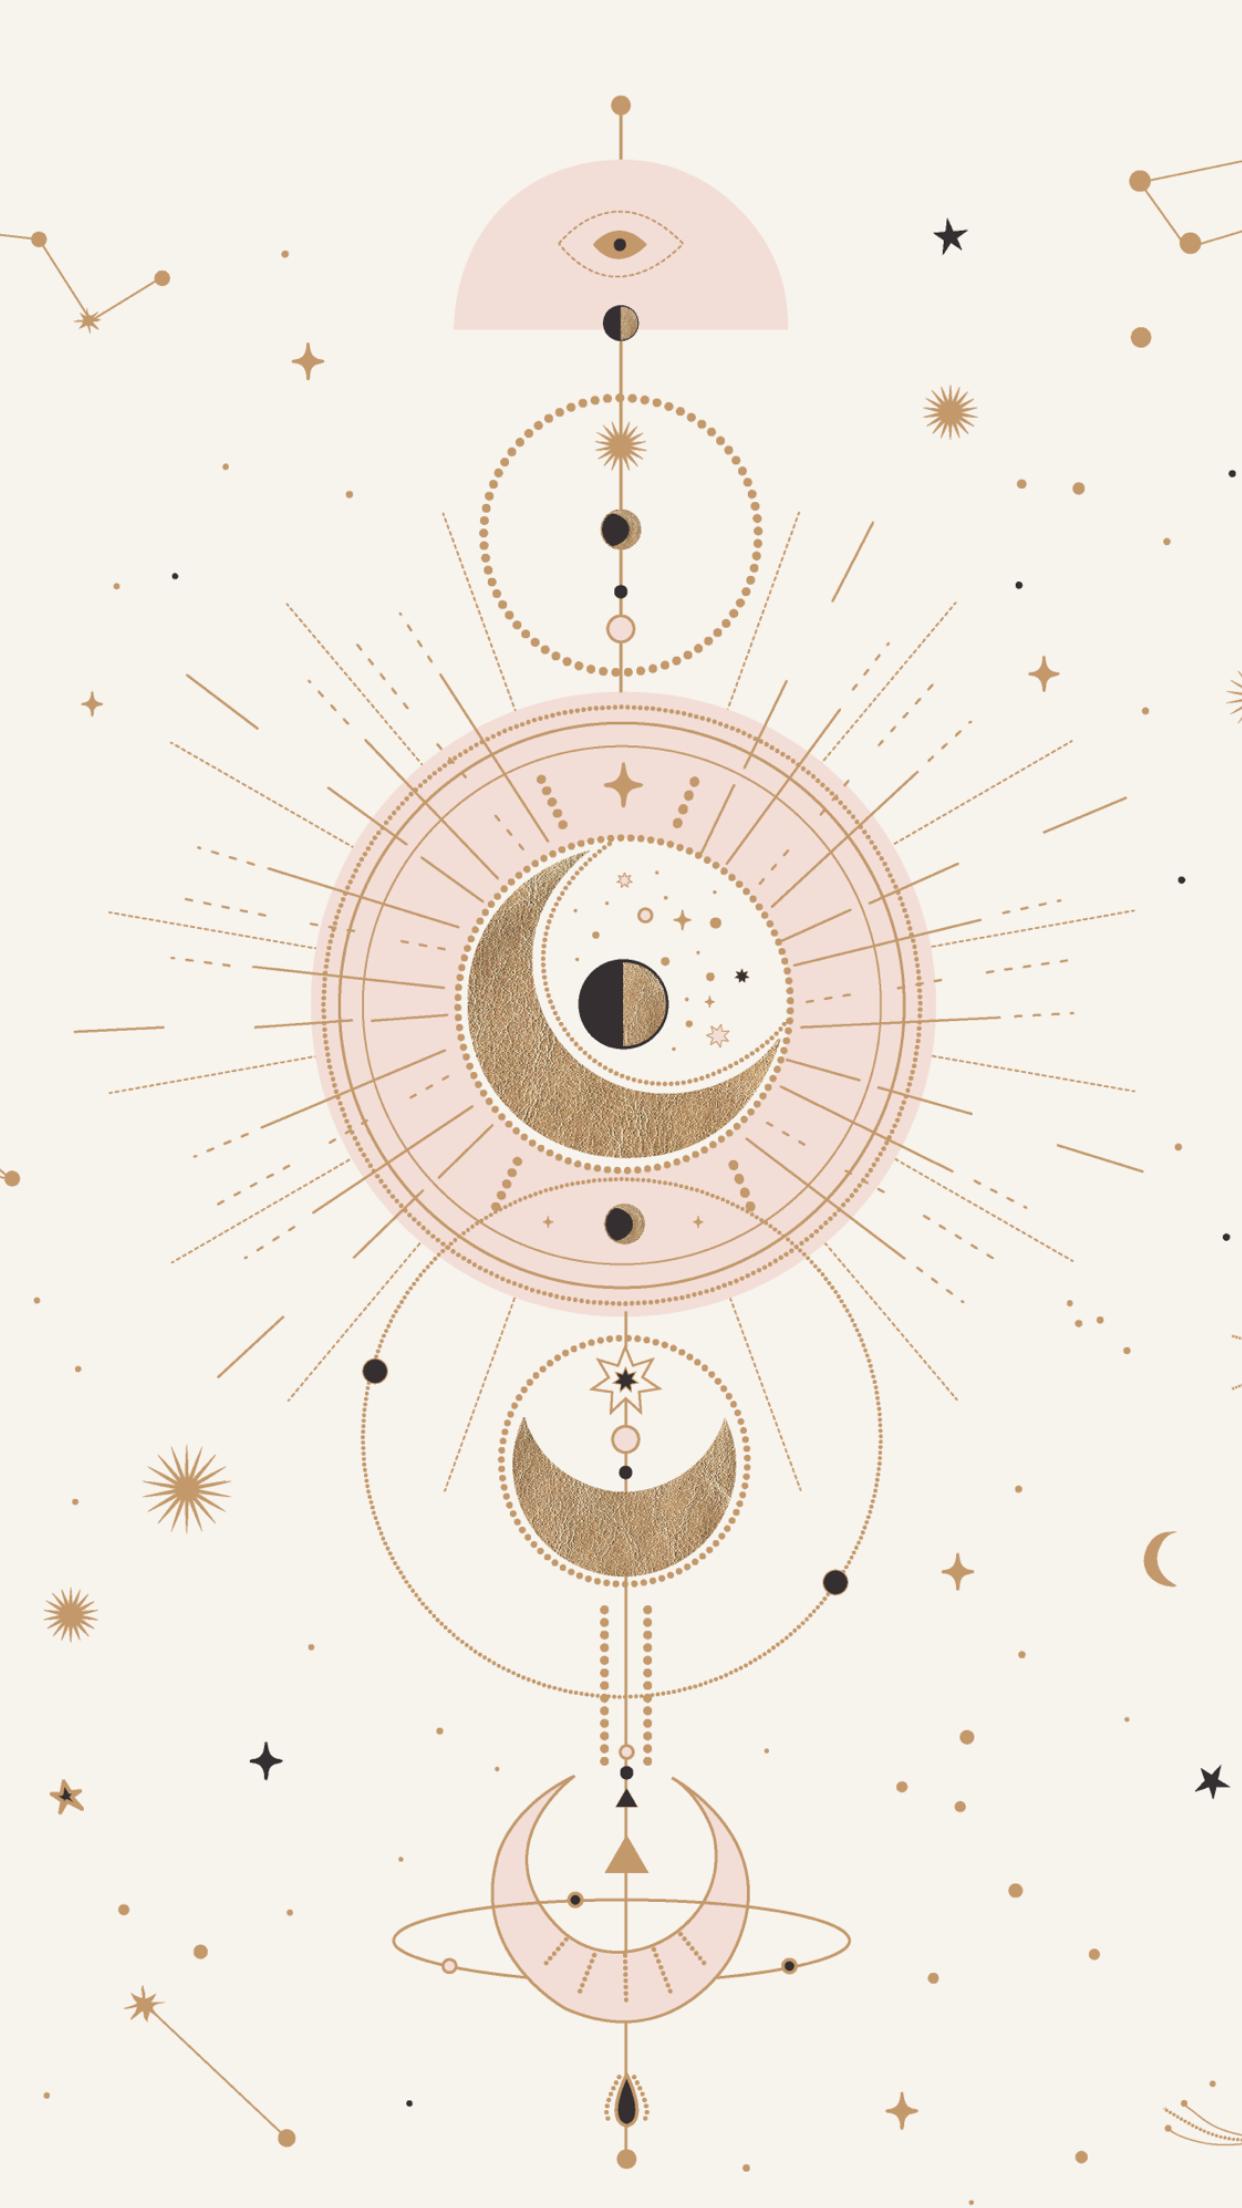 Moon design art | #opulentmemory #astrologyaesthetic